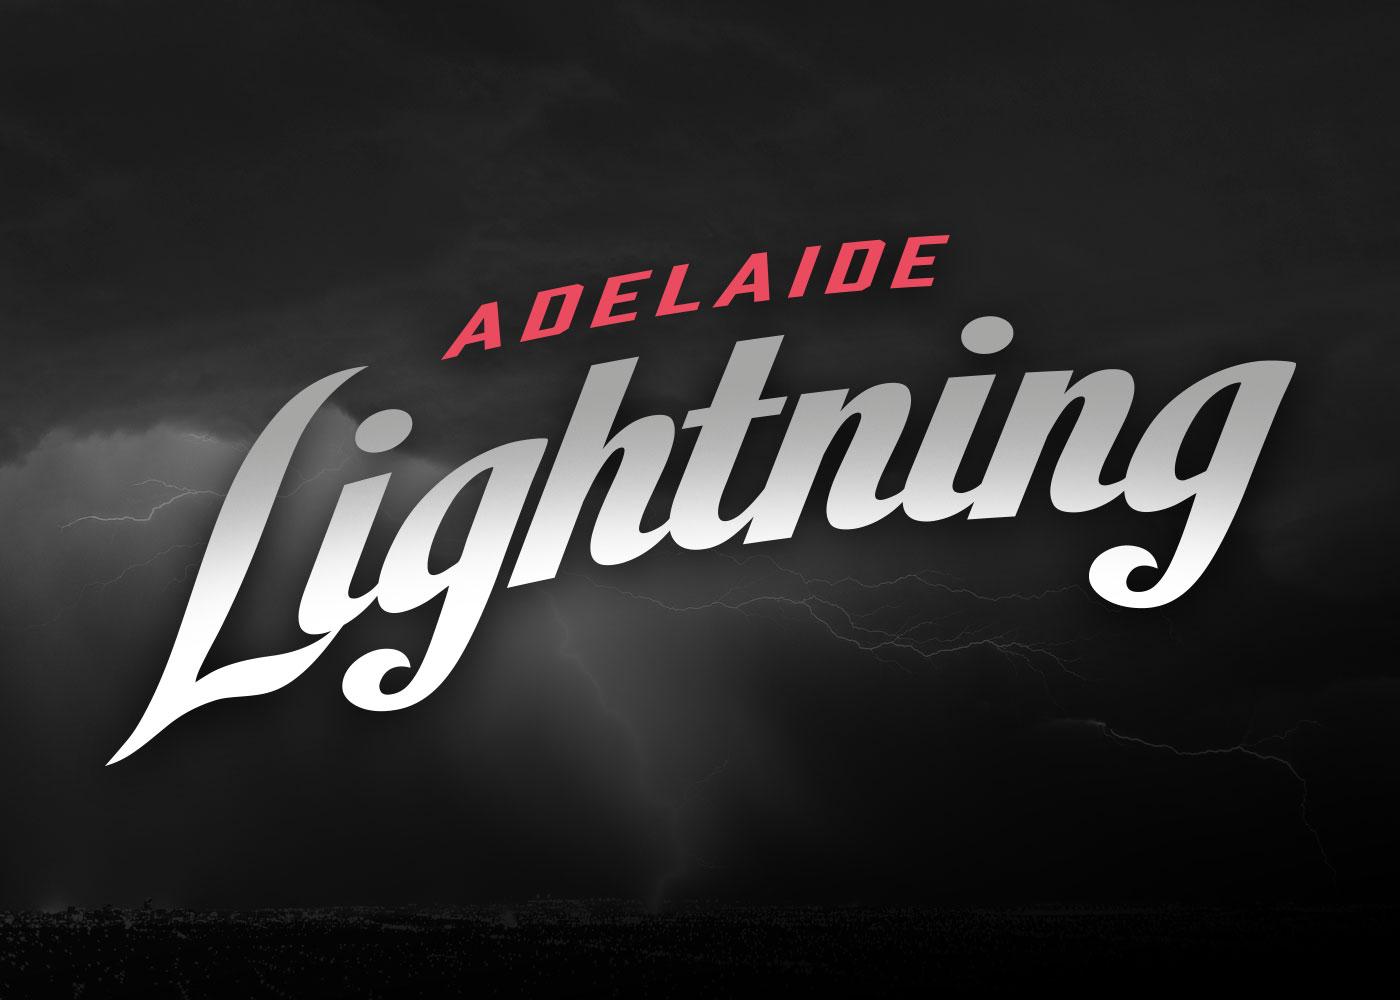 ADELAIDE-LIGHTNING_WebPage_02